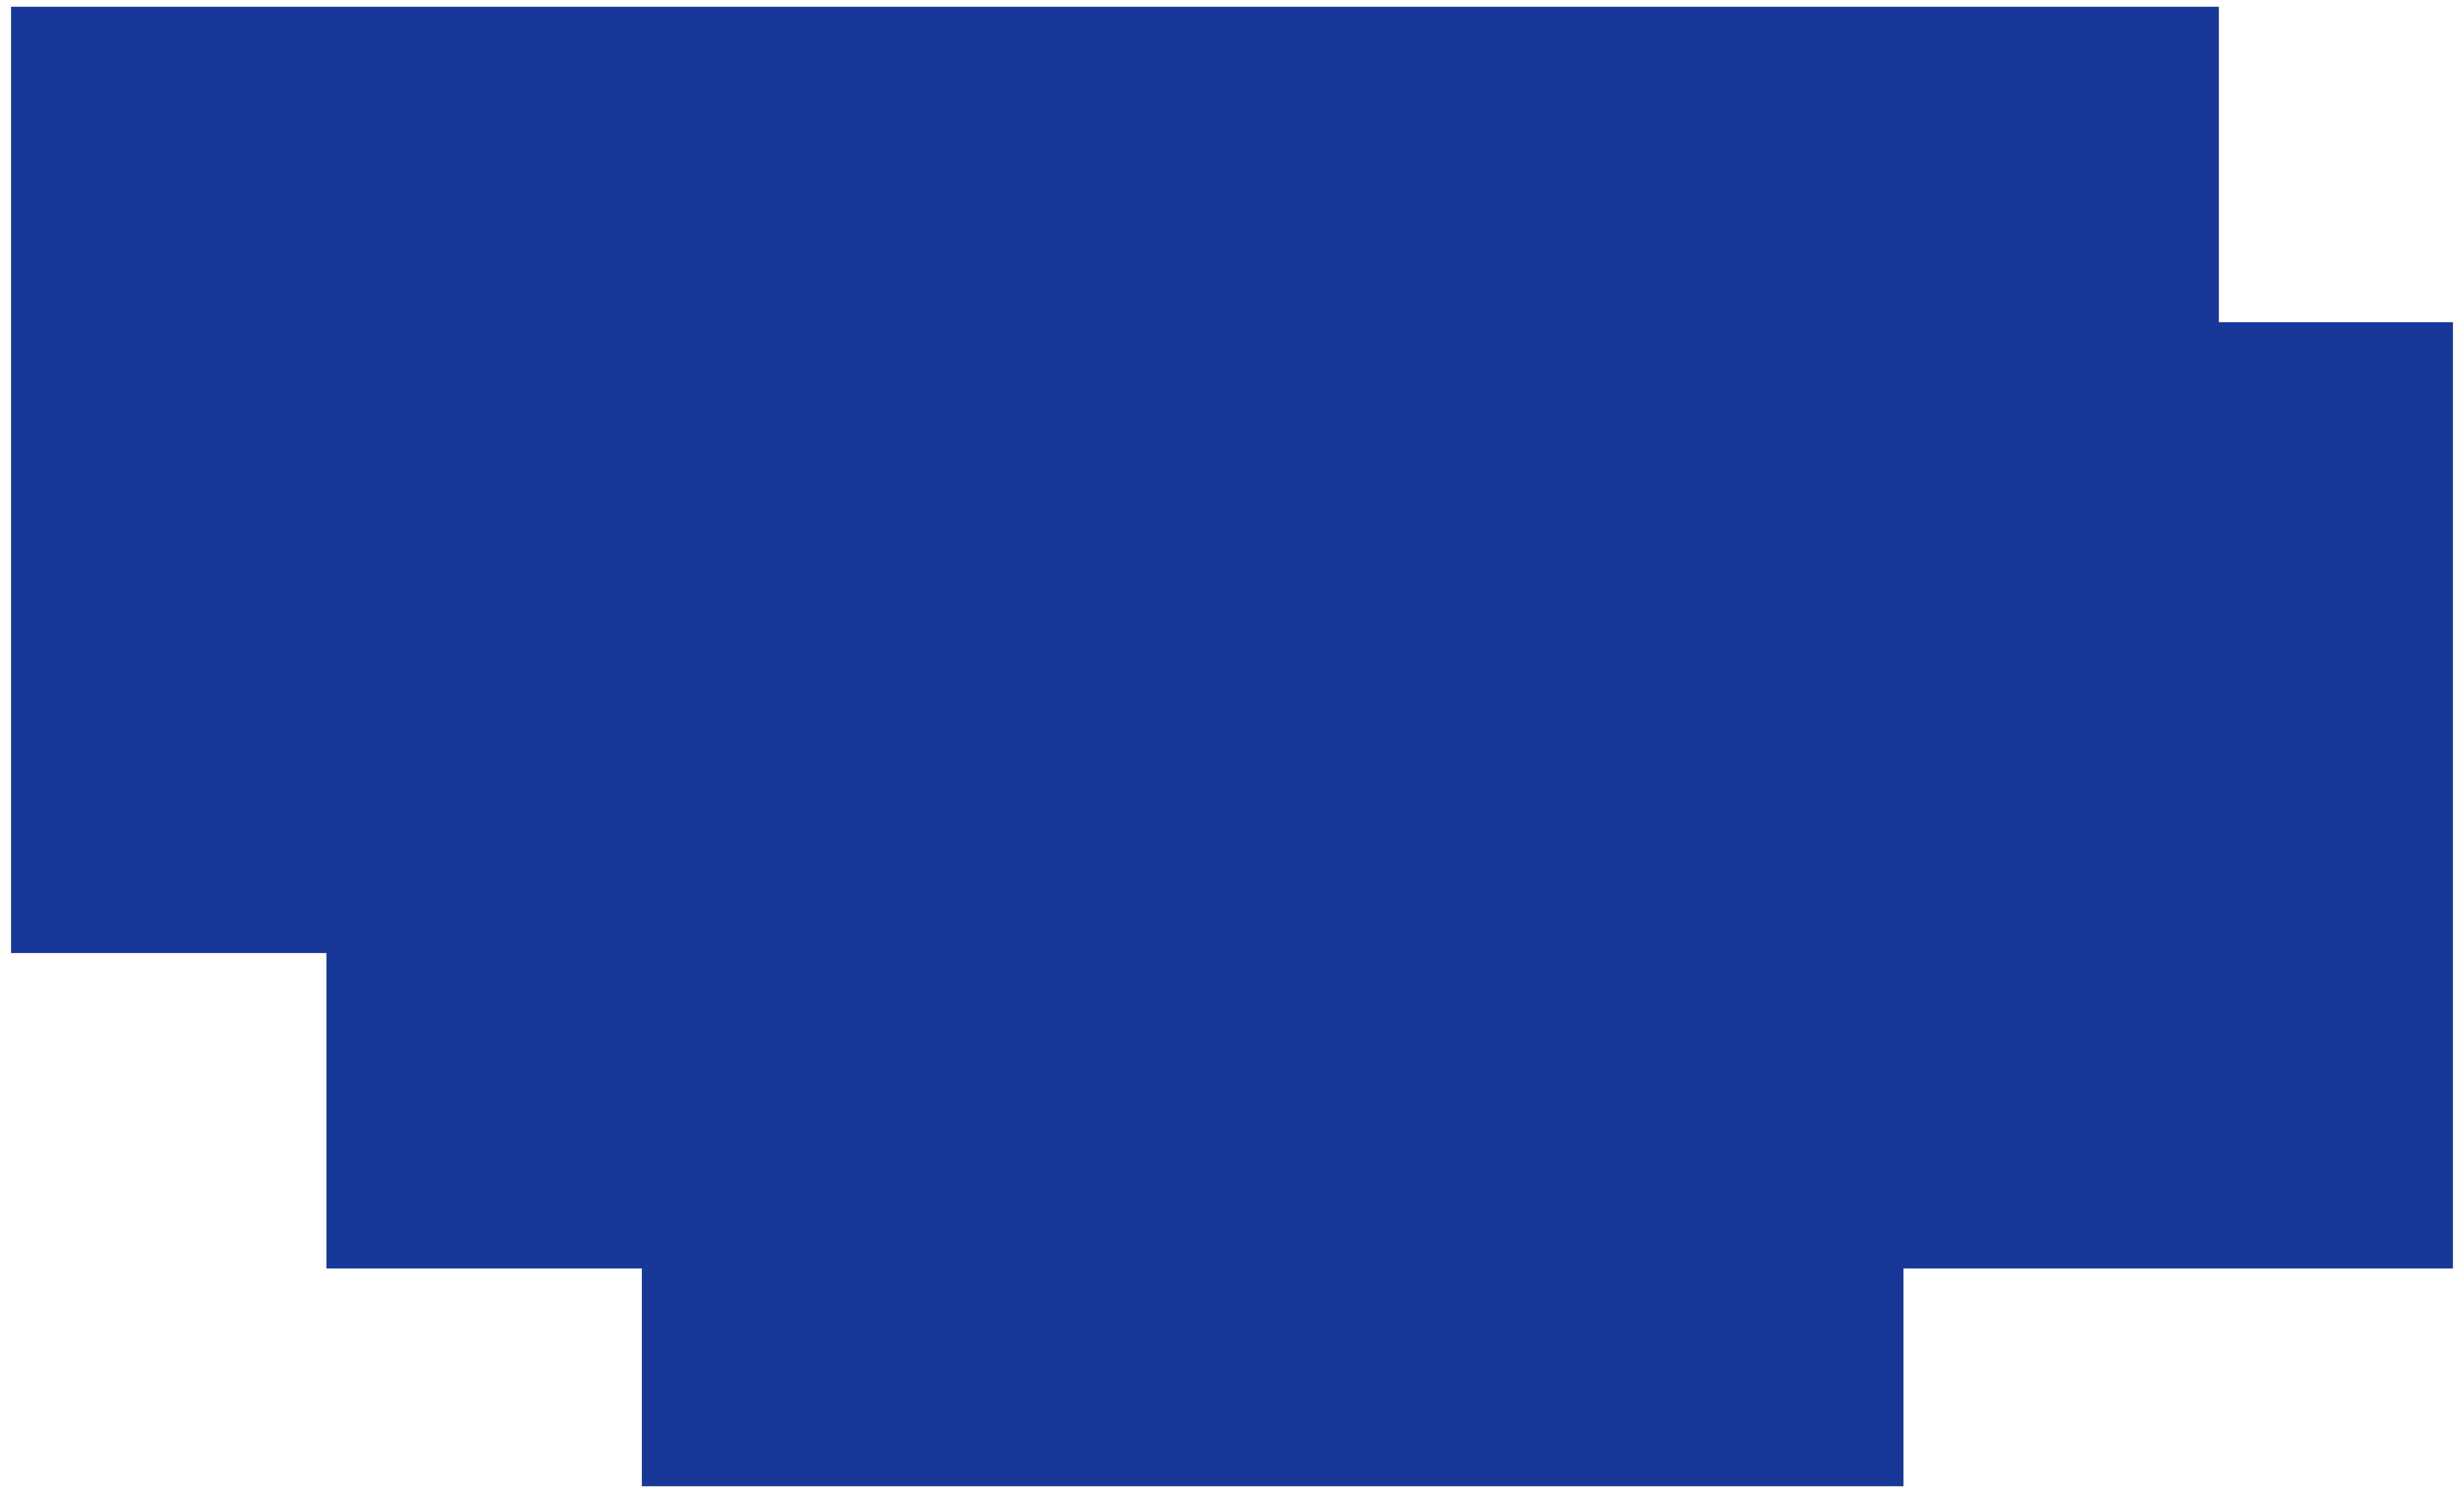 Handshake clipart. Transparent png clip art